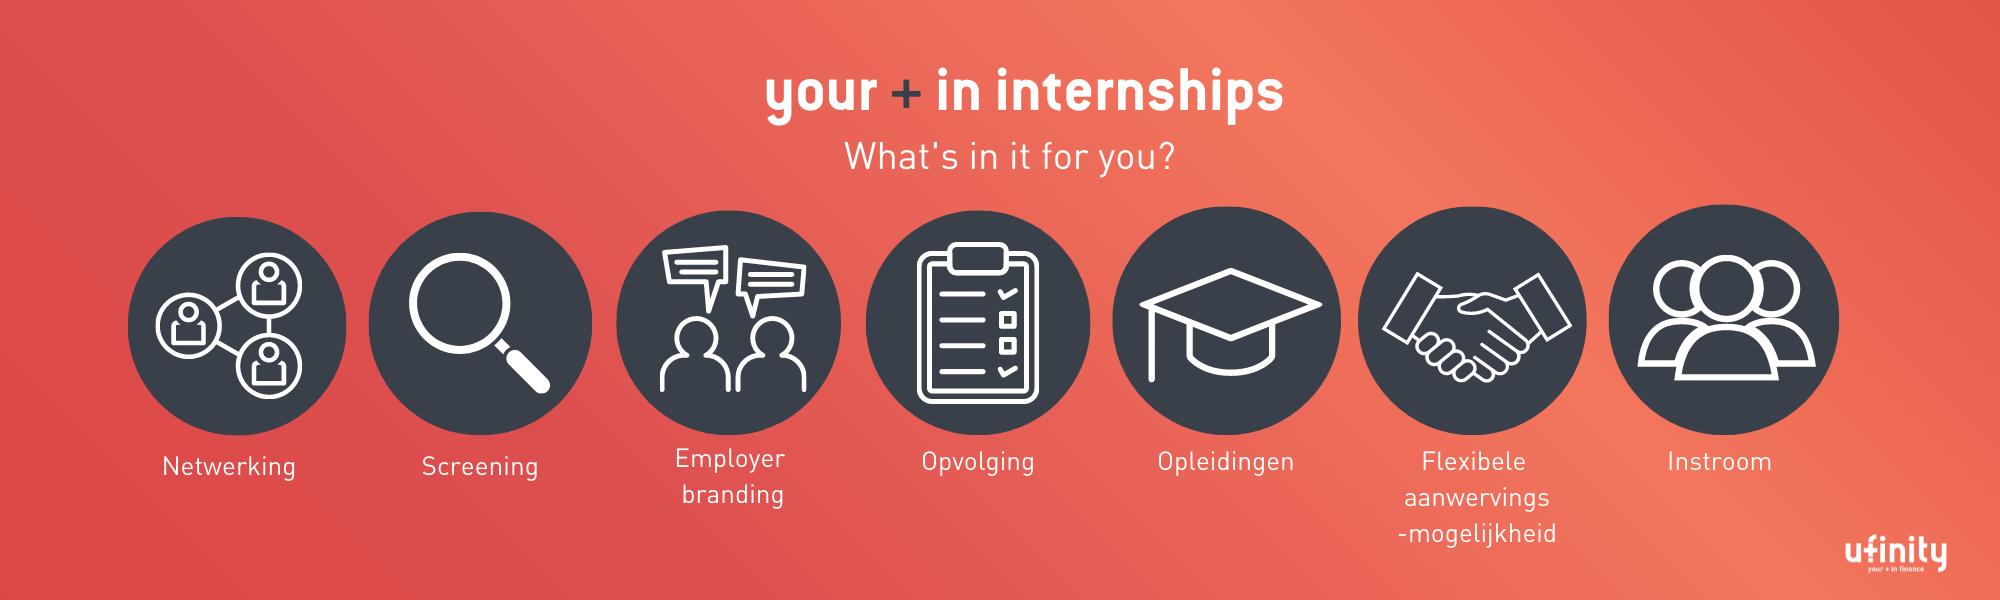 Your + in internships - Finsight